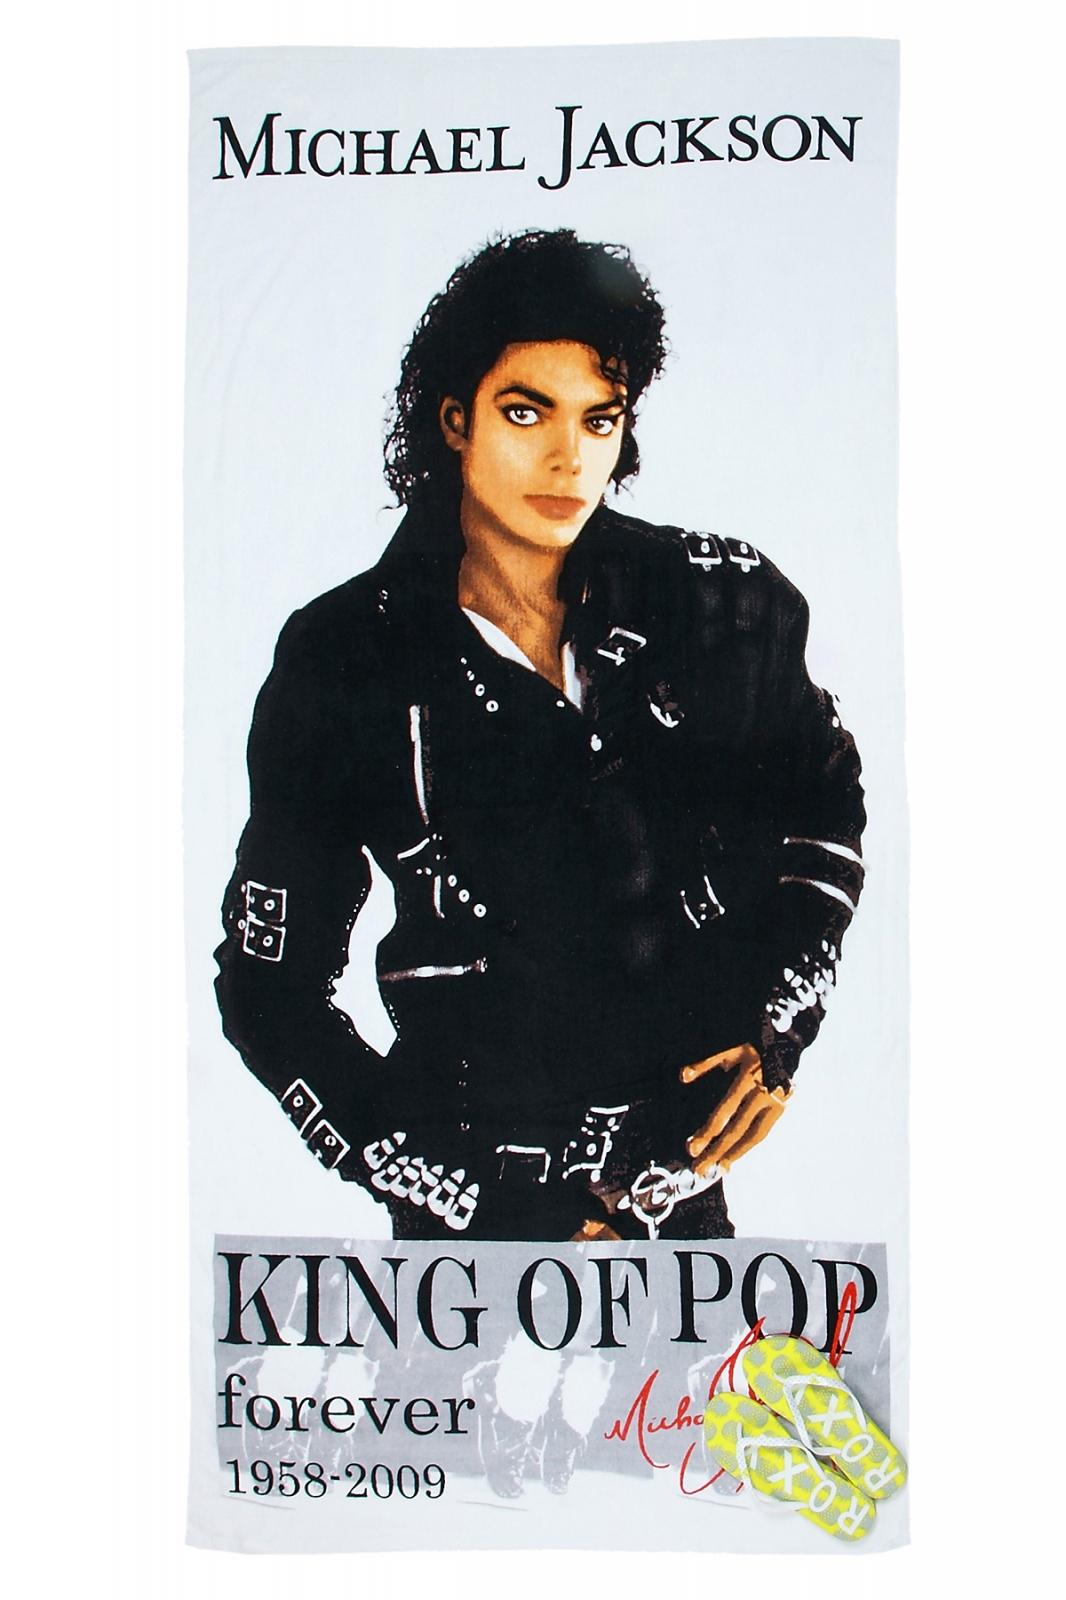 Полотенца Майкл Джексон оптом со скидками